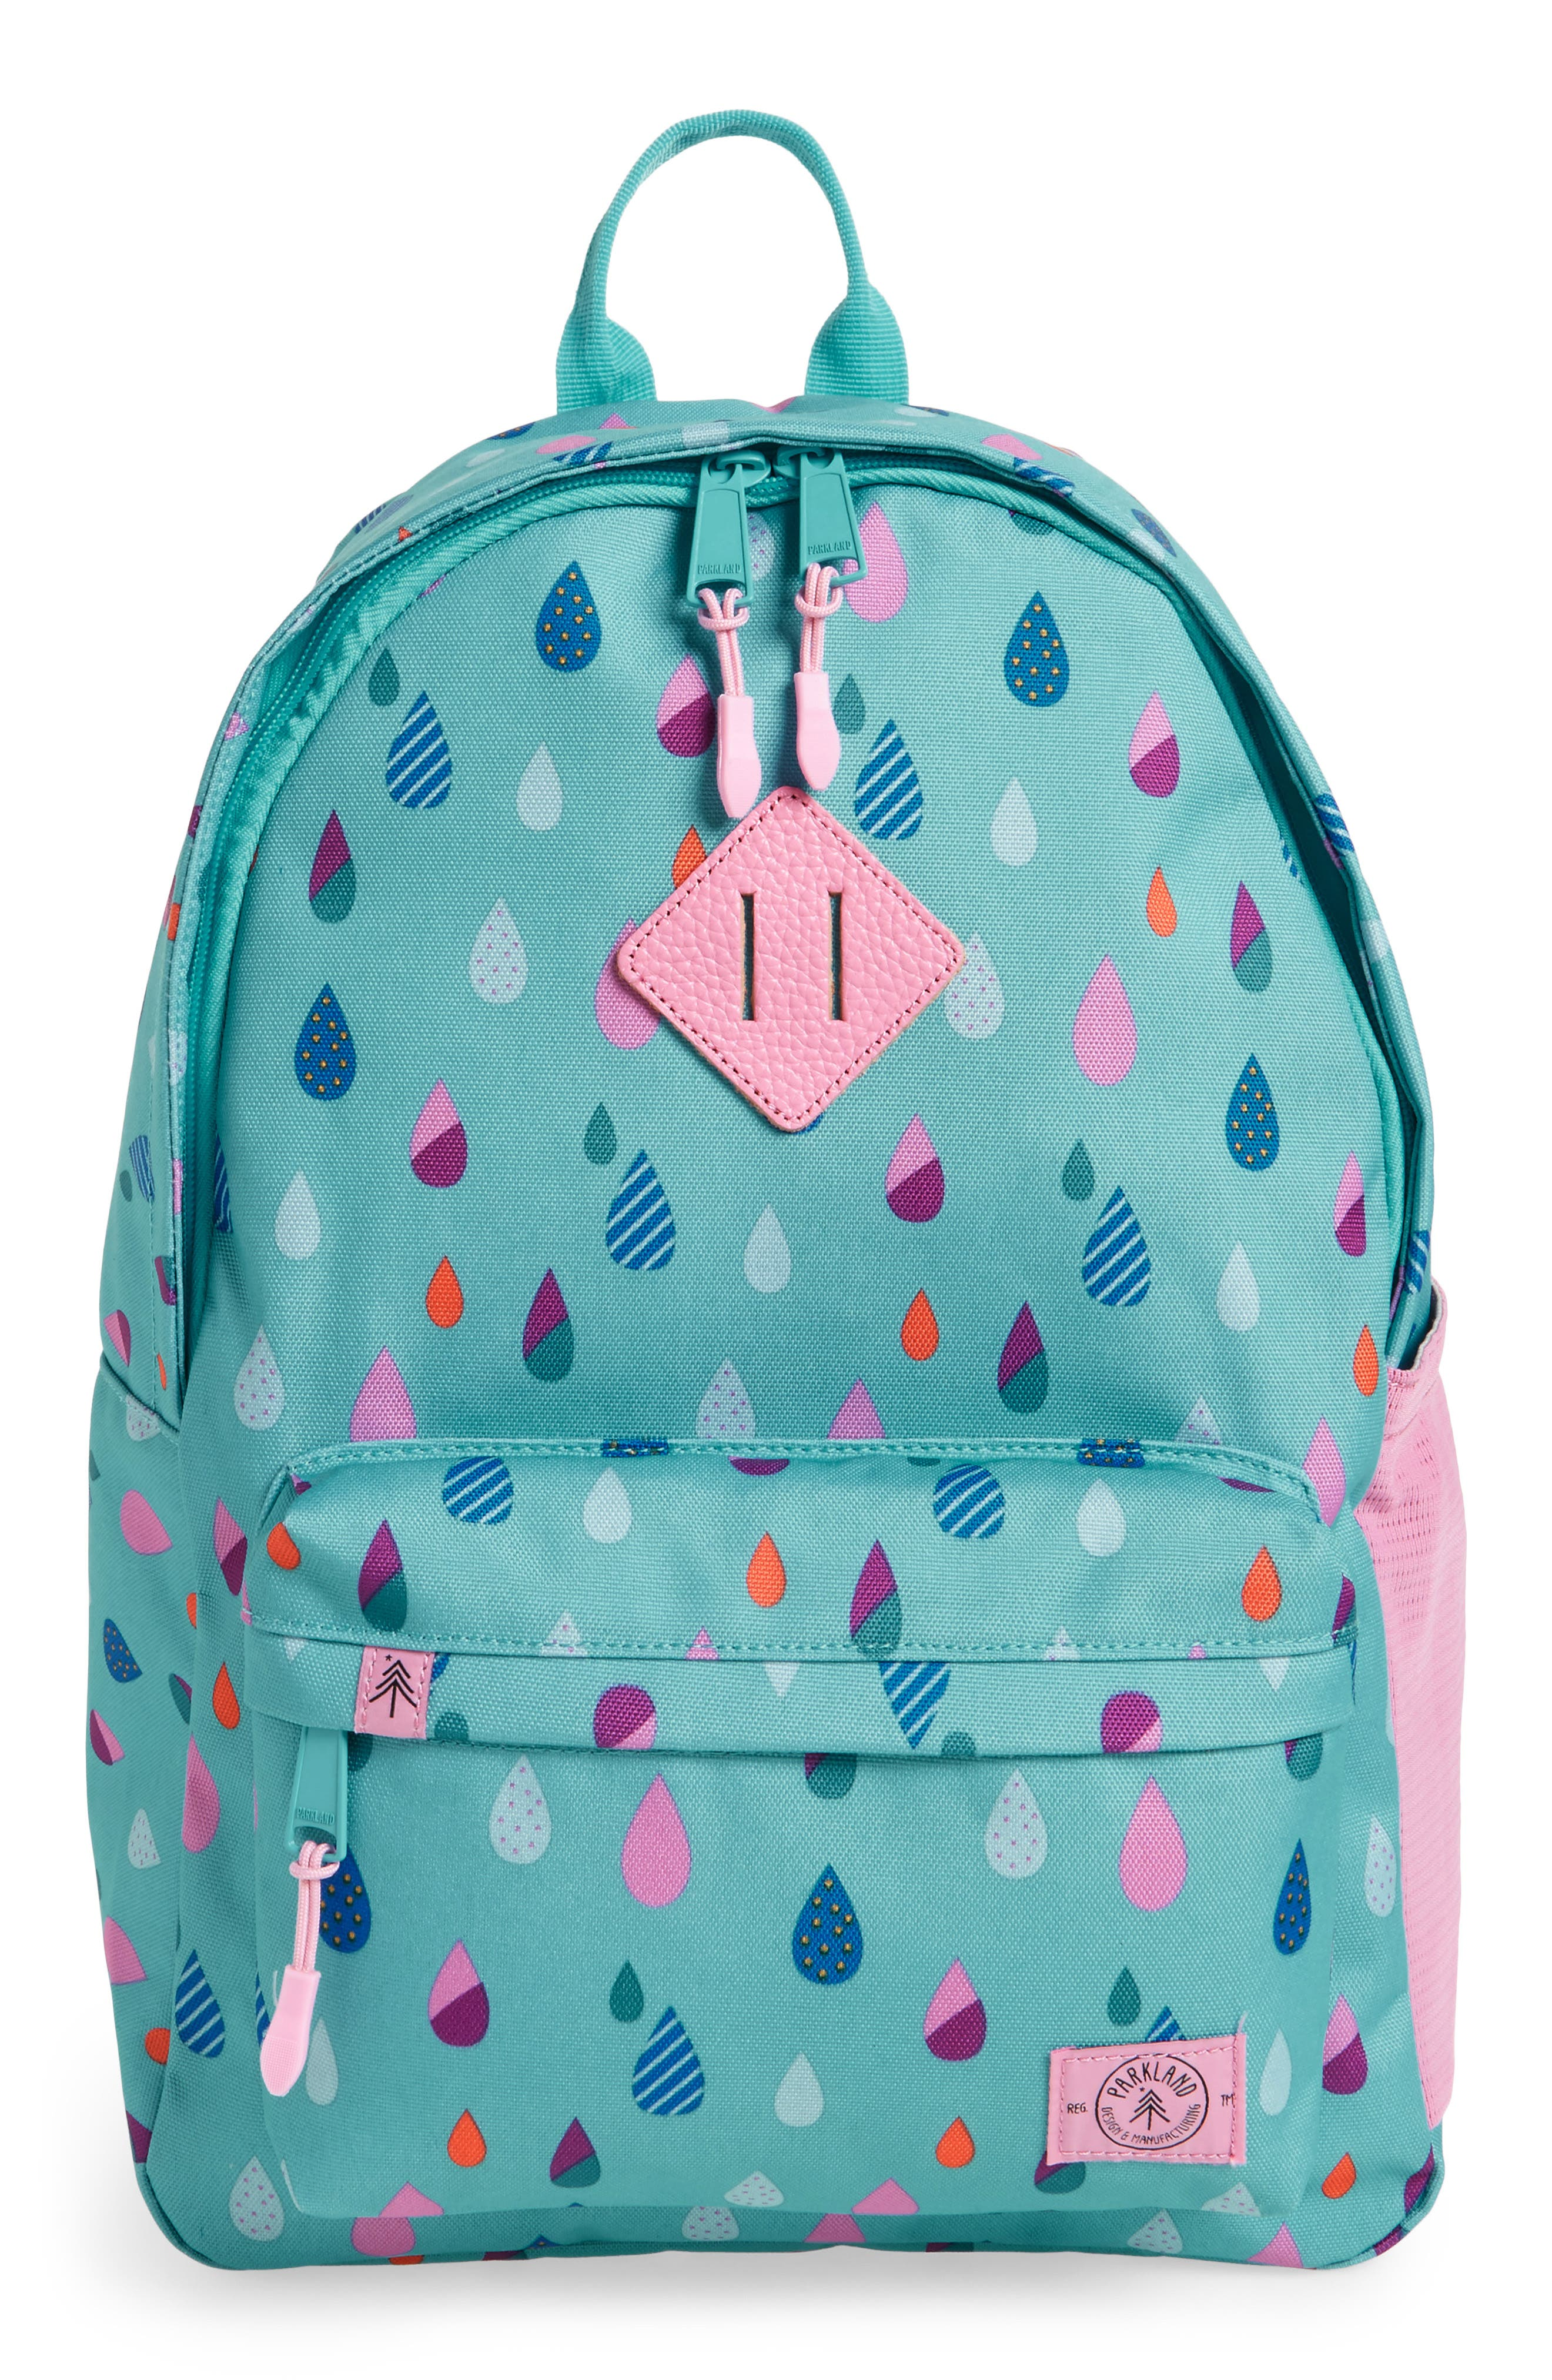 Bayside - Puddles Backpack,                             Main thumbnail 1, color,                             Blue